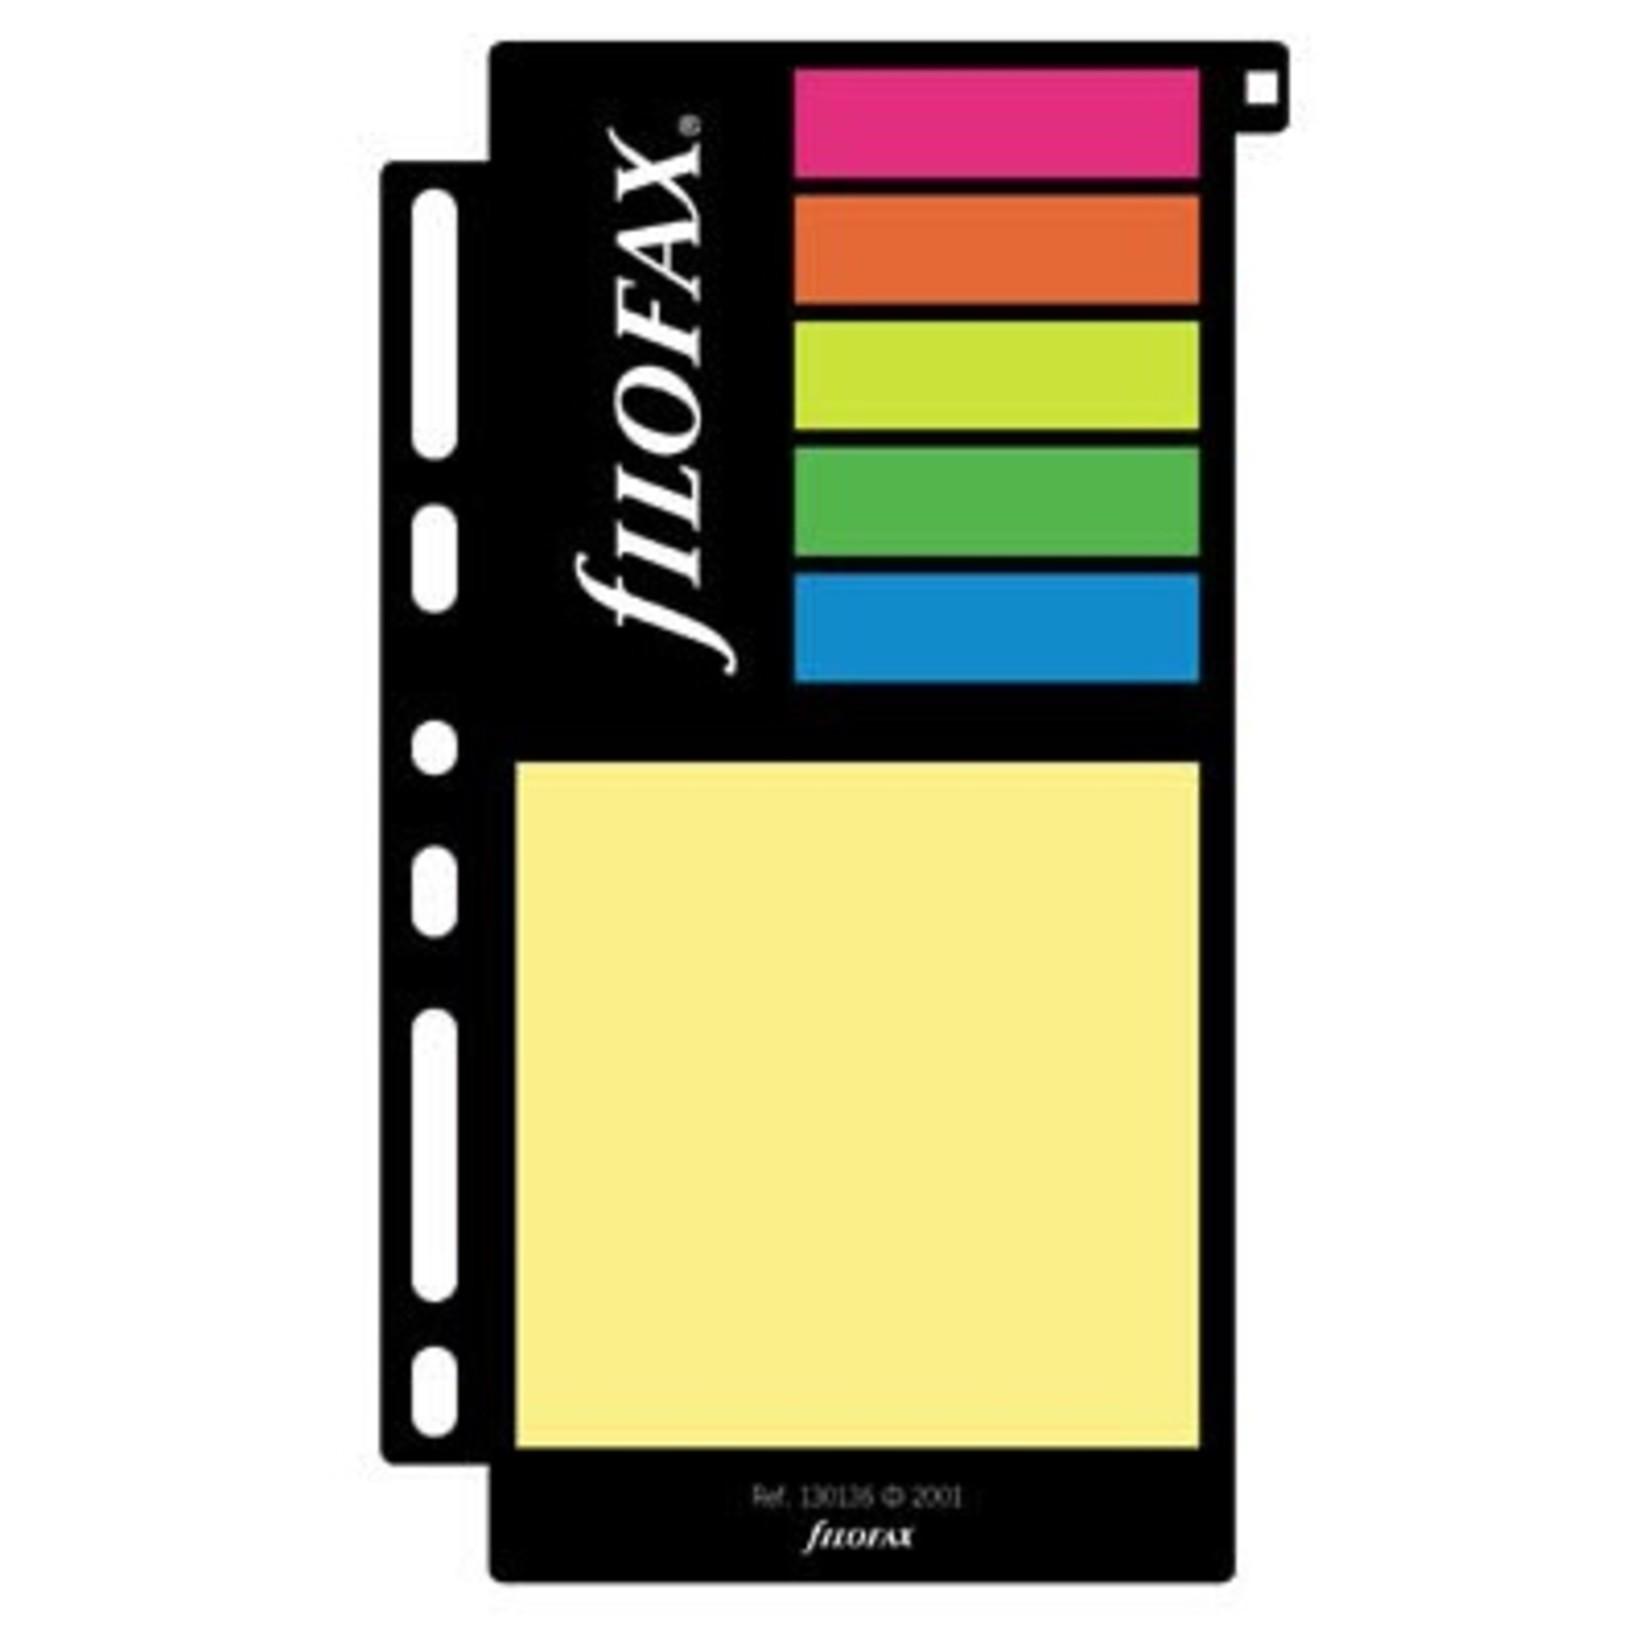 Filofax Filofax Einlage Personal, Haftnotizen, mehrfarbig